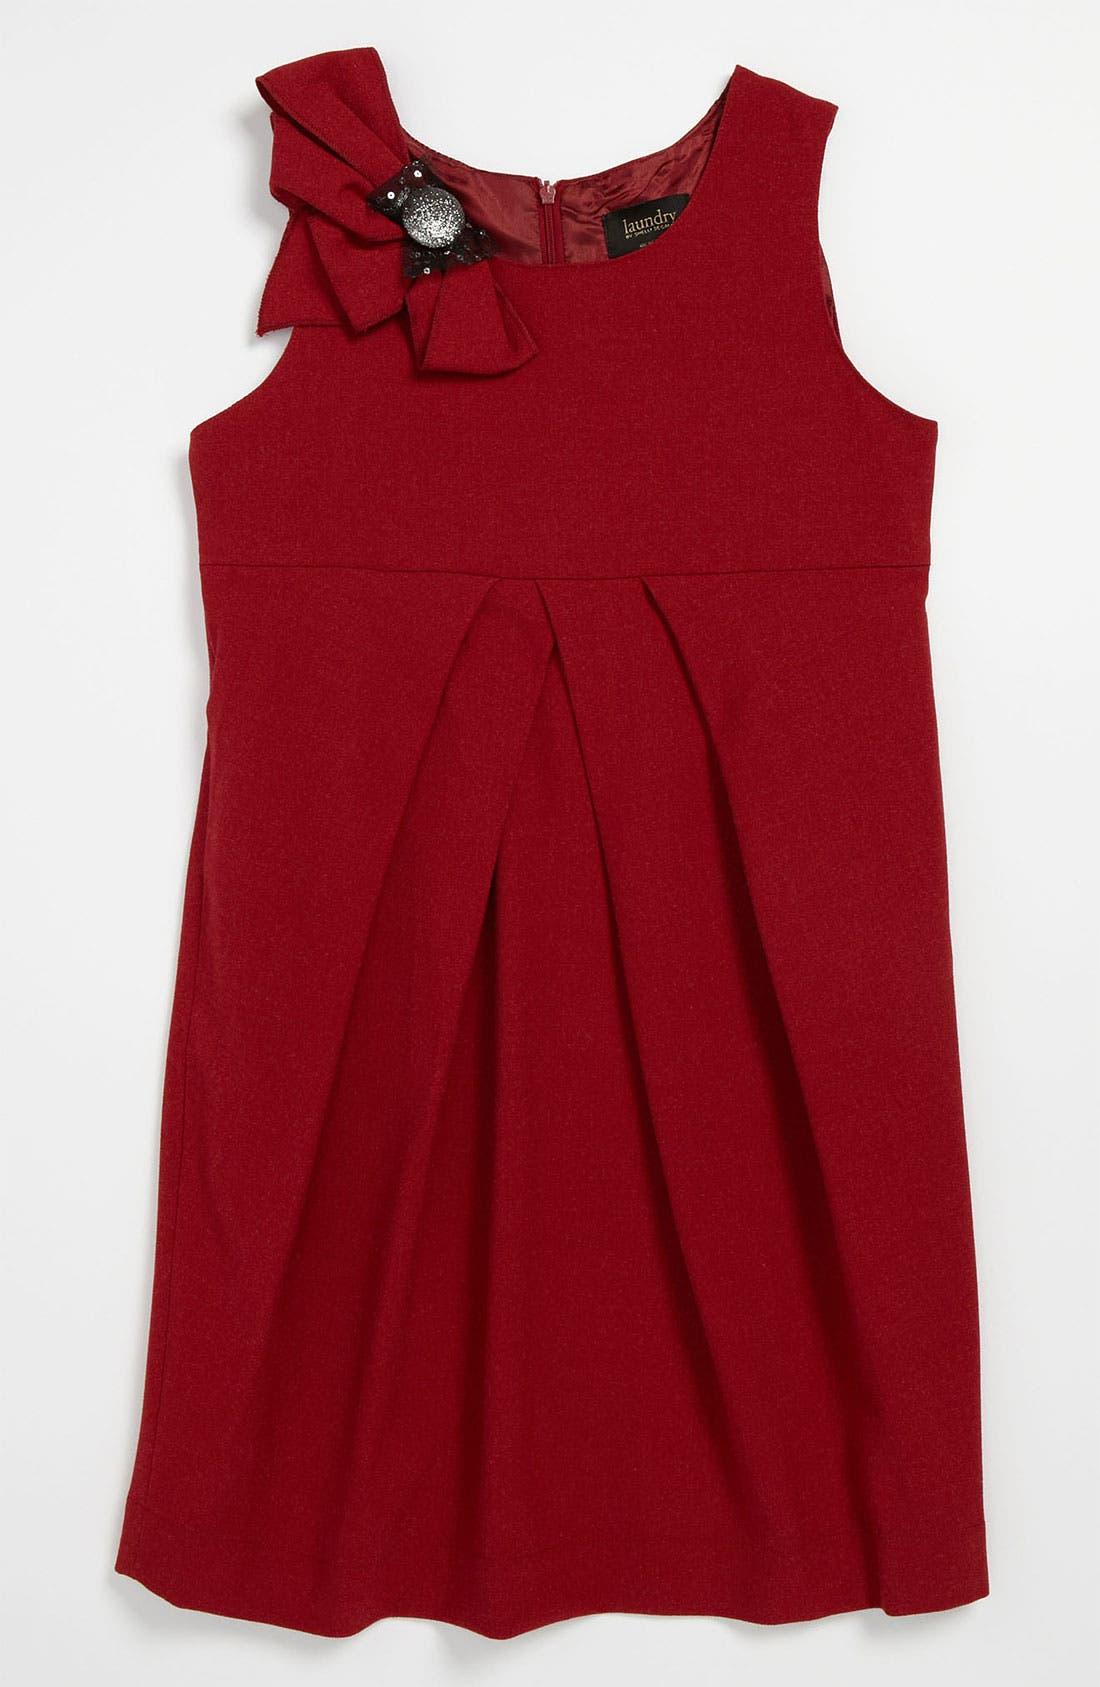 Main Image - Laundry by Shelli Segal 'Chelsea' Dress (Big Girls)